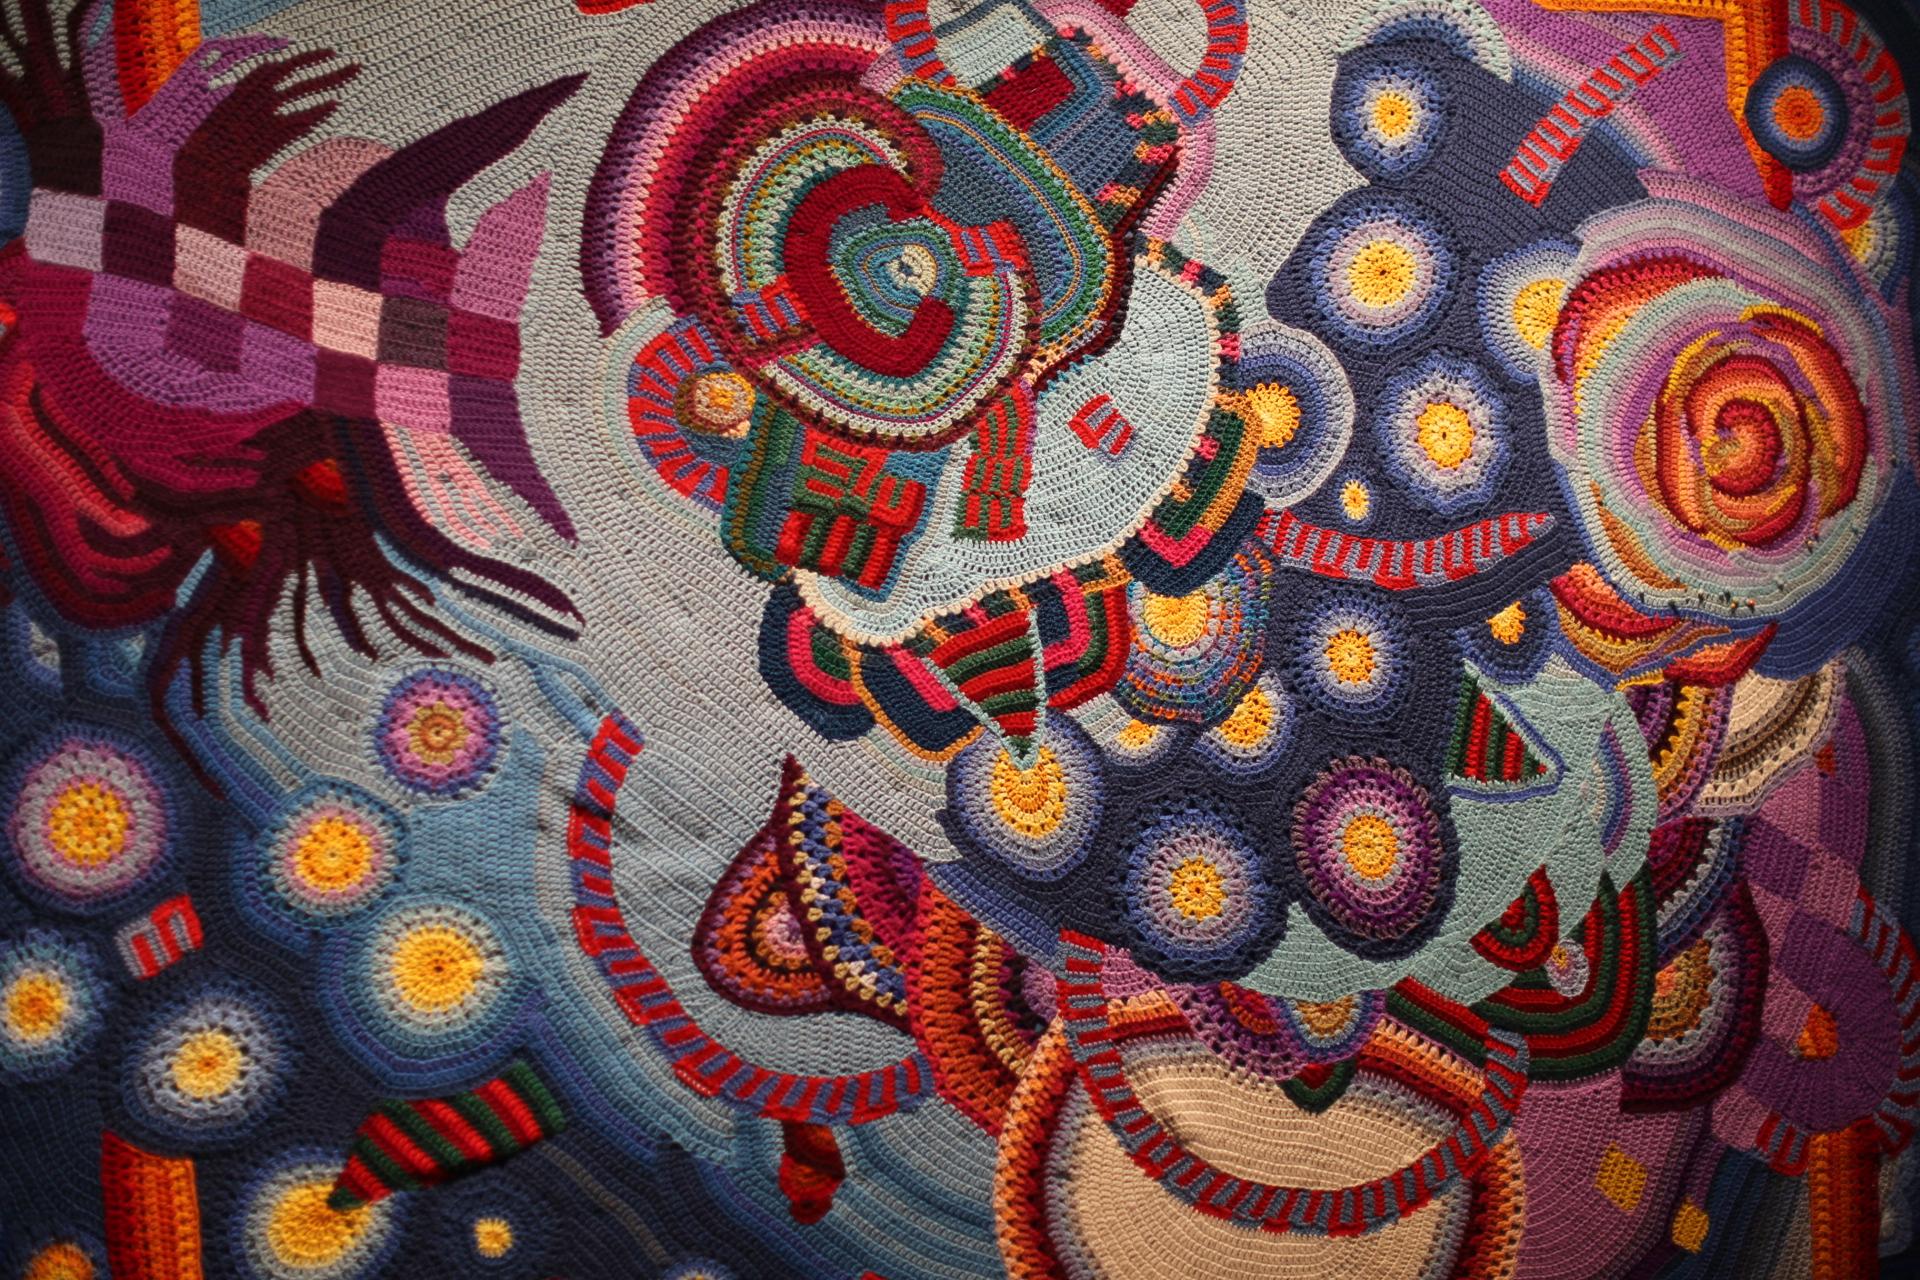 Crochet bedspread de Young Museum Bob Weir Grateful Dead